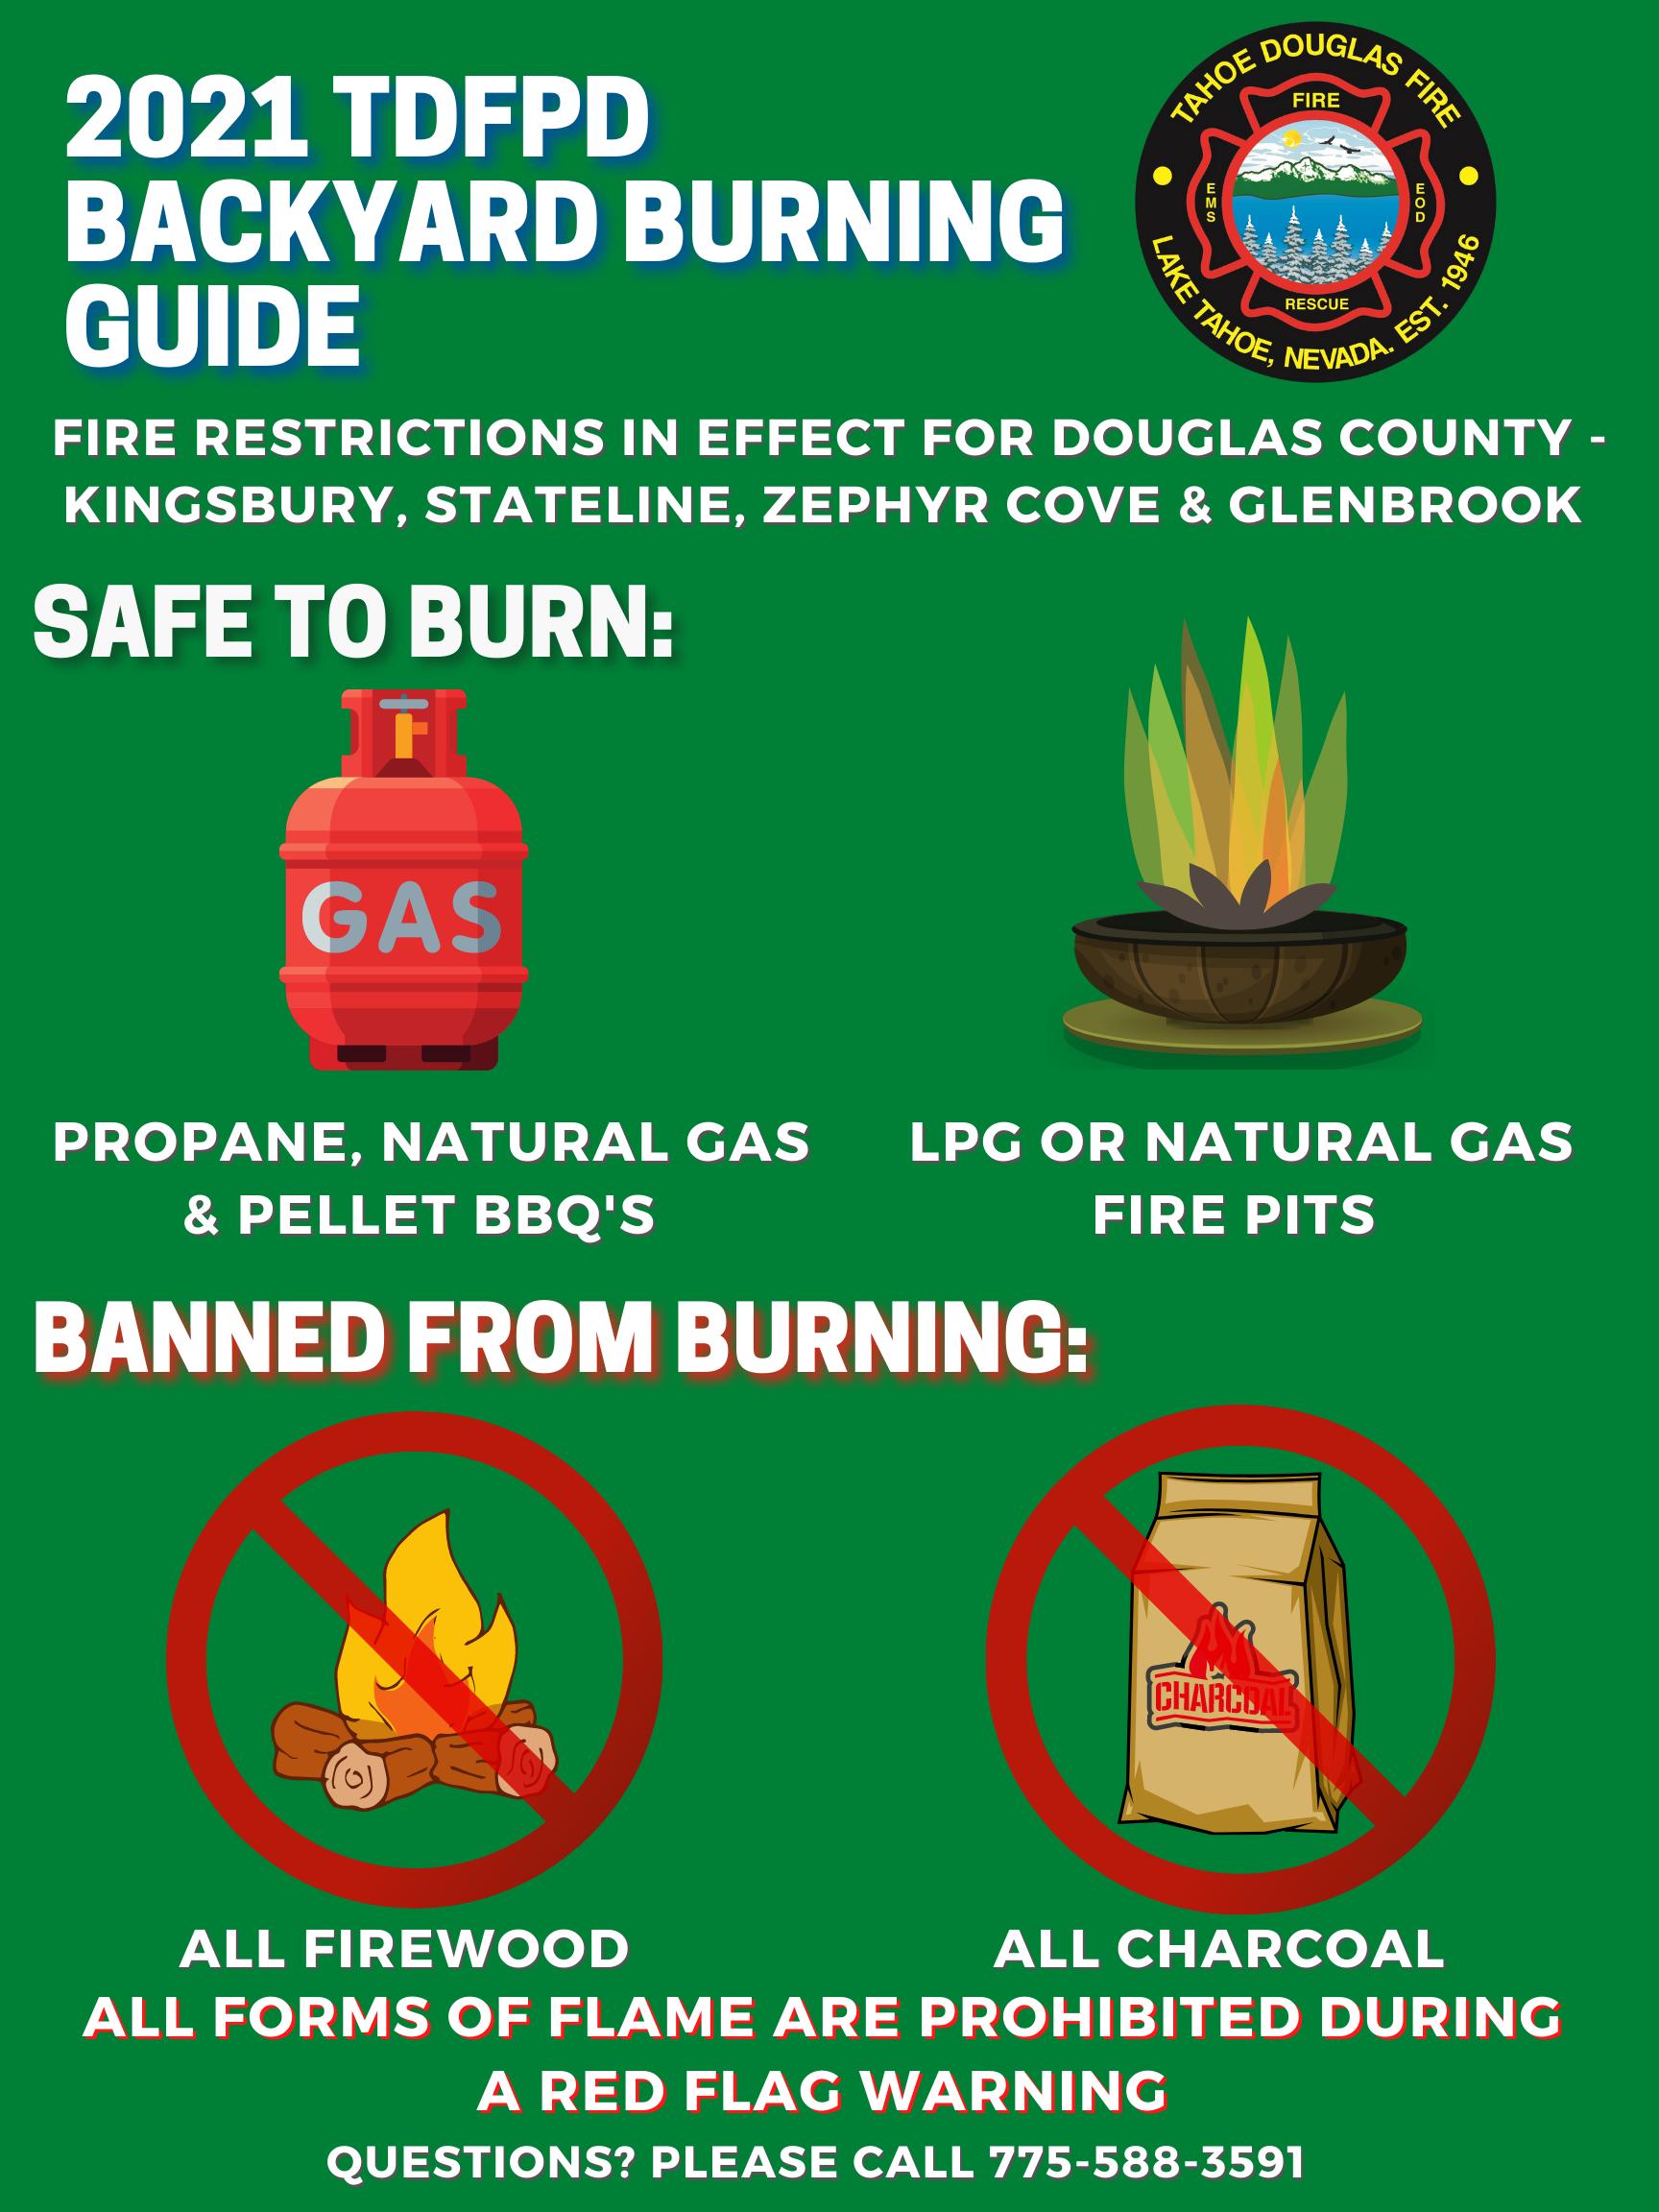 TDFPD District Burn Bans in Effect